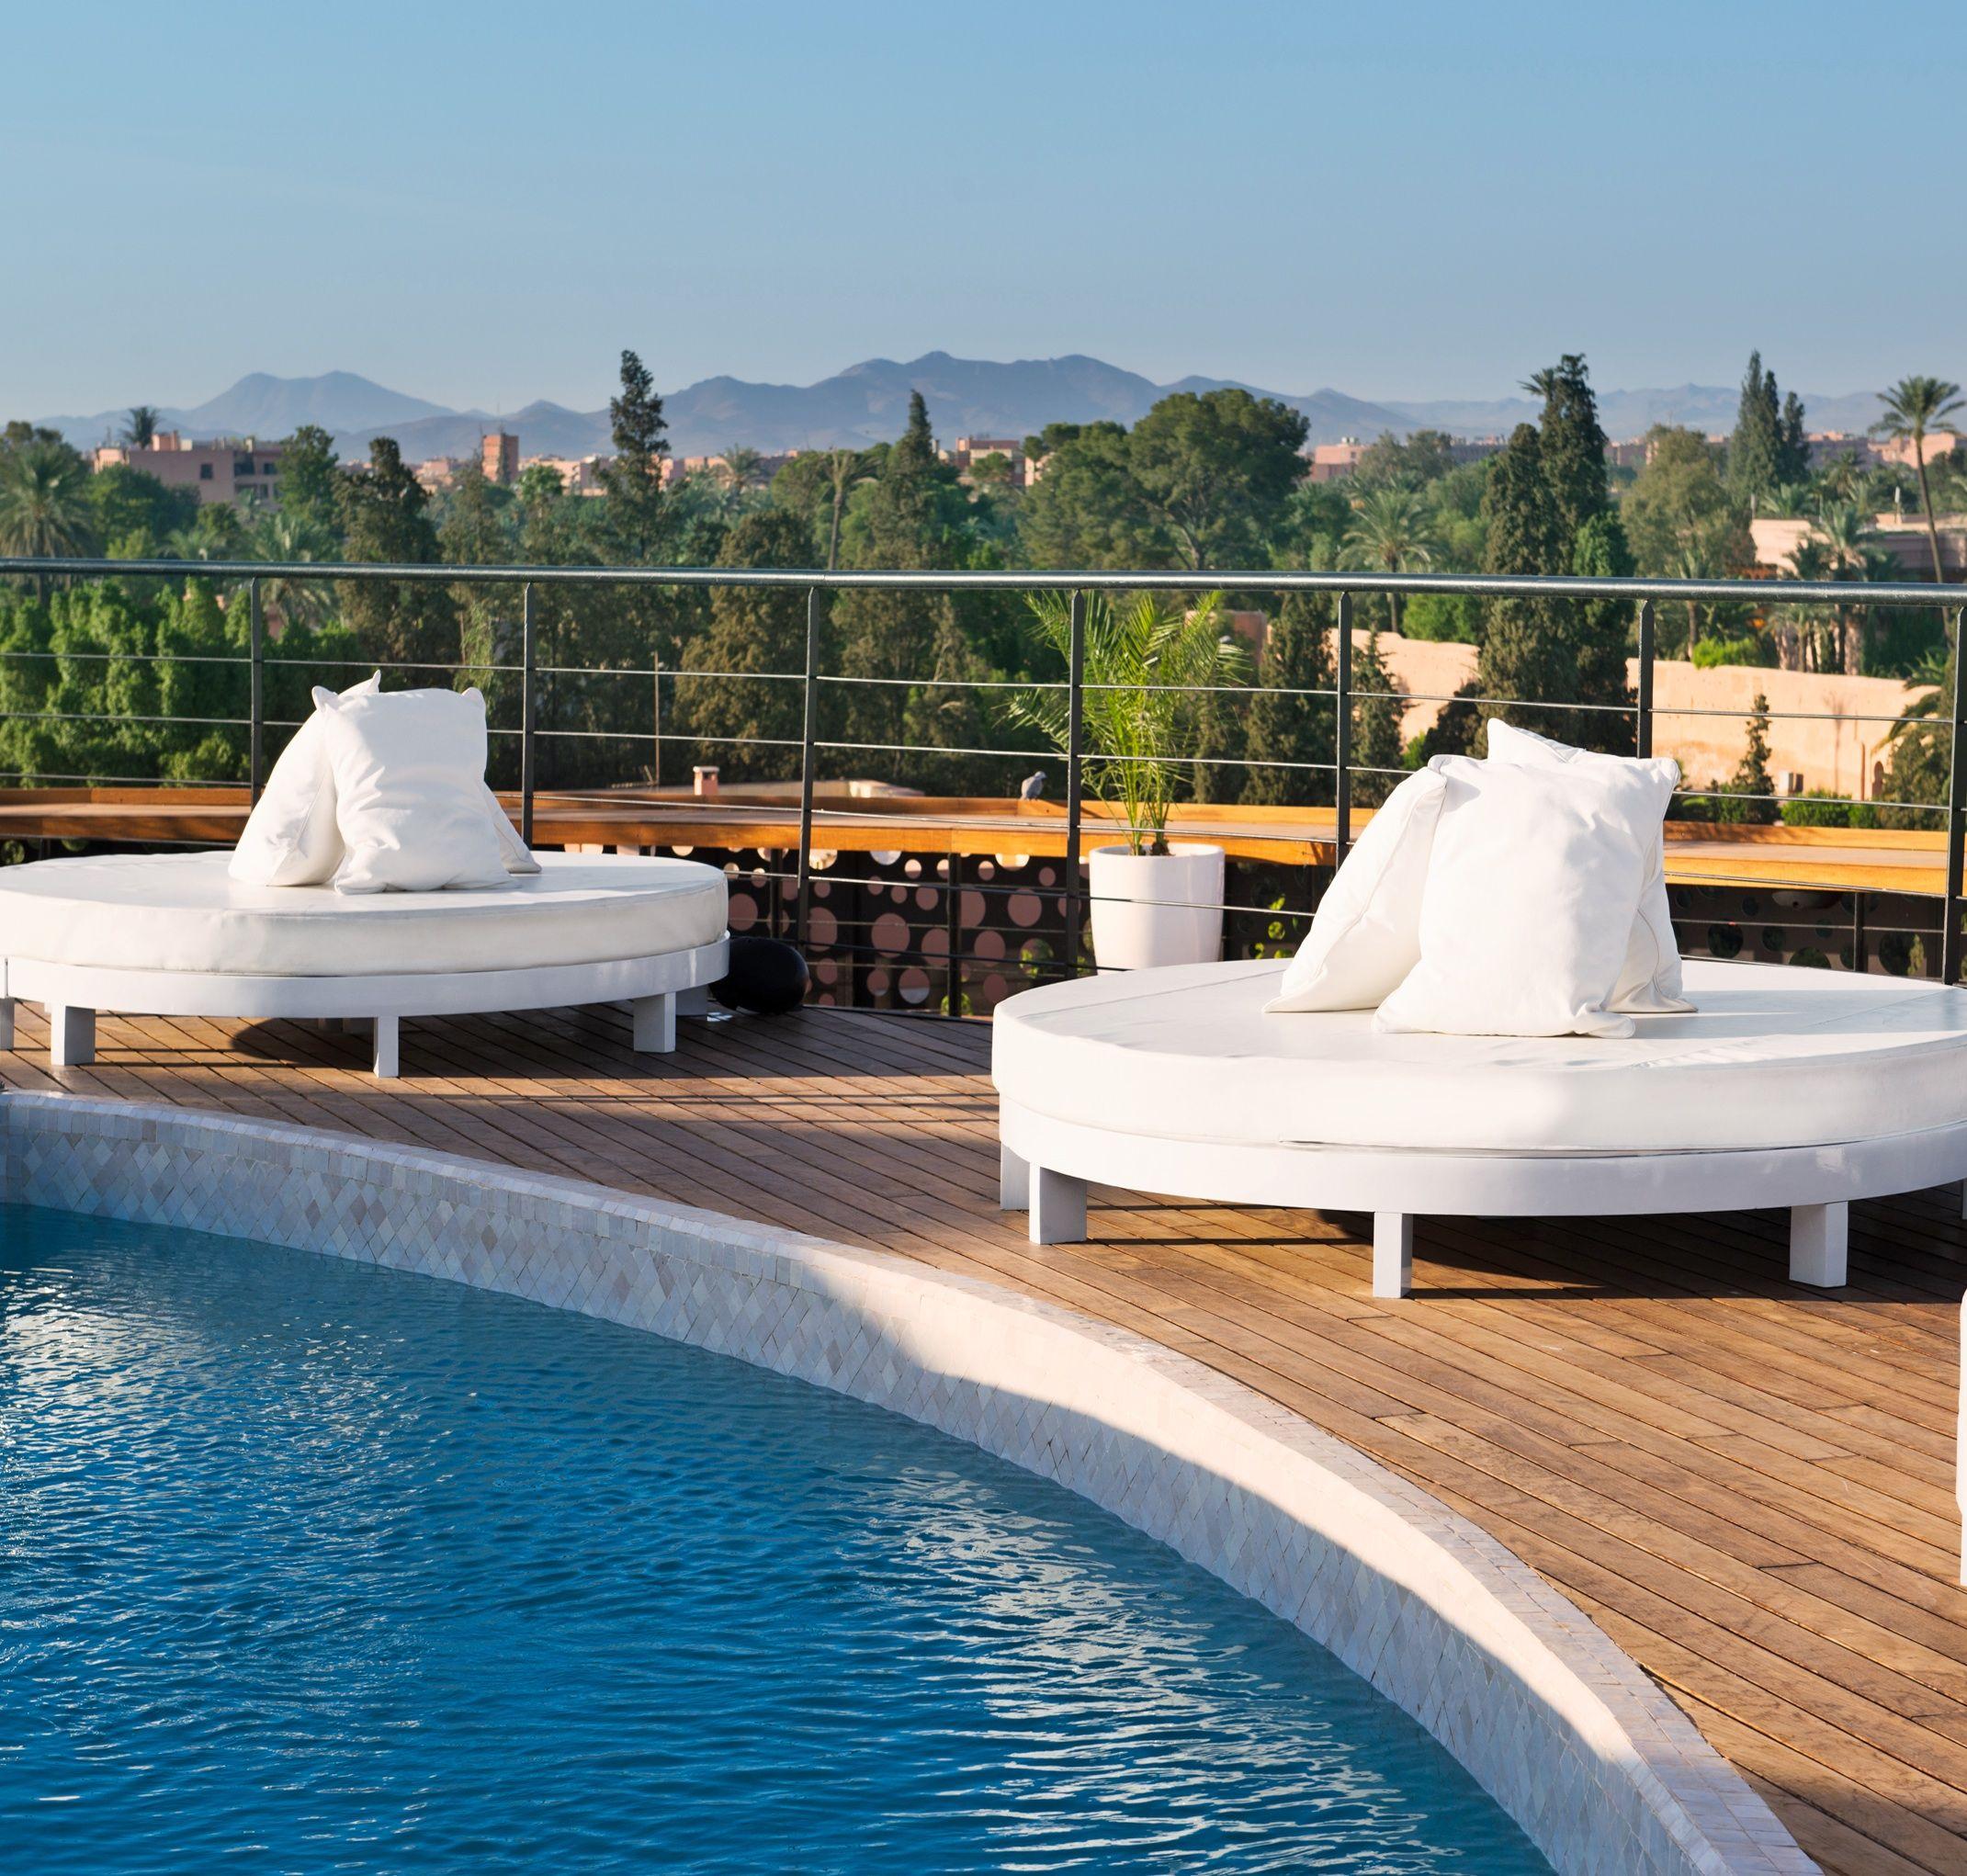 Luxurious Zen Resort: The Pearl Marrakech (Marrakech, Morocco